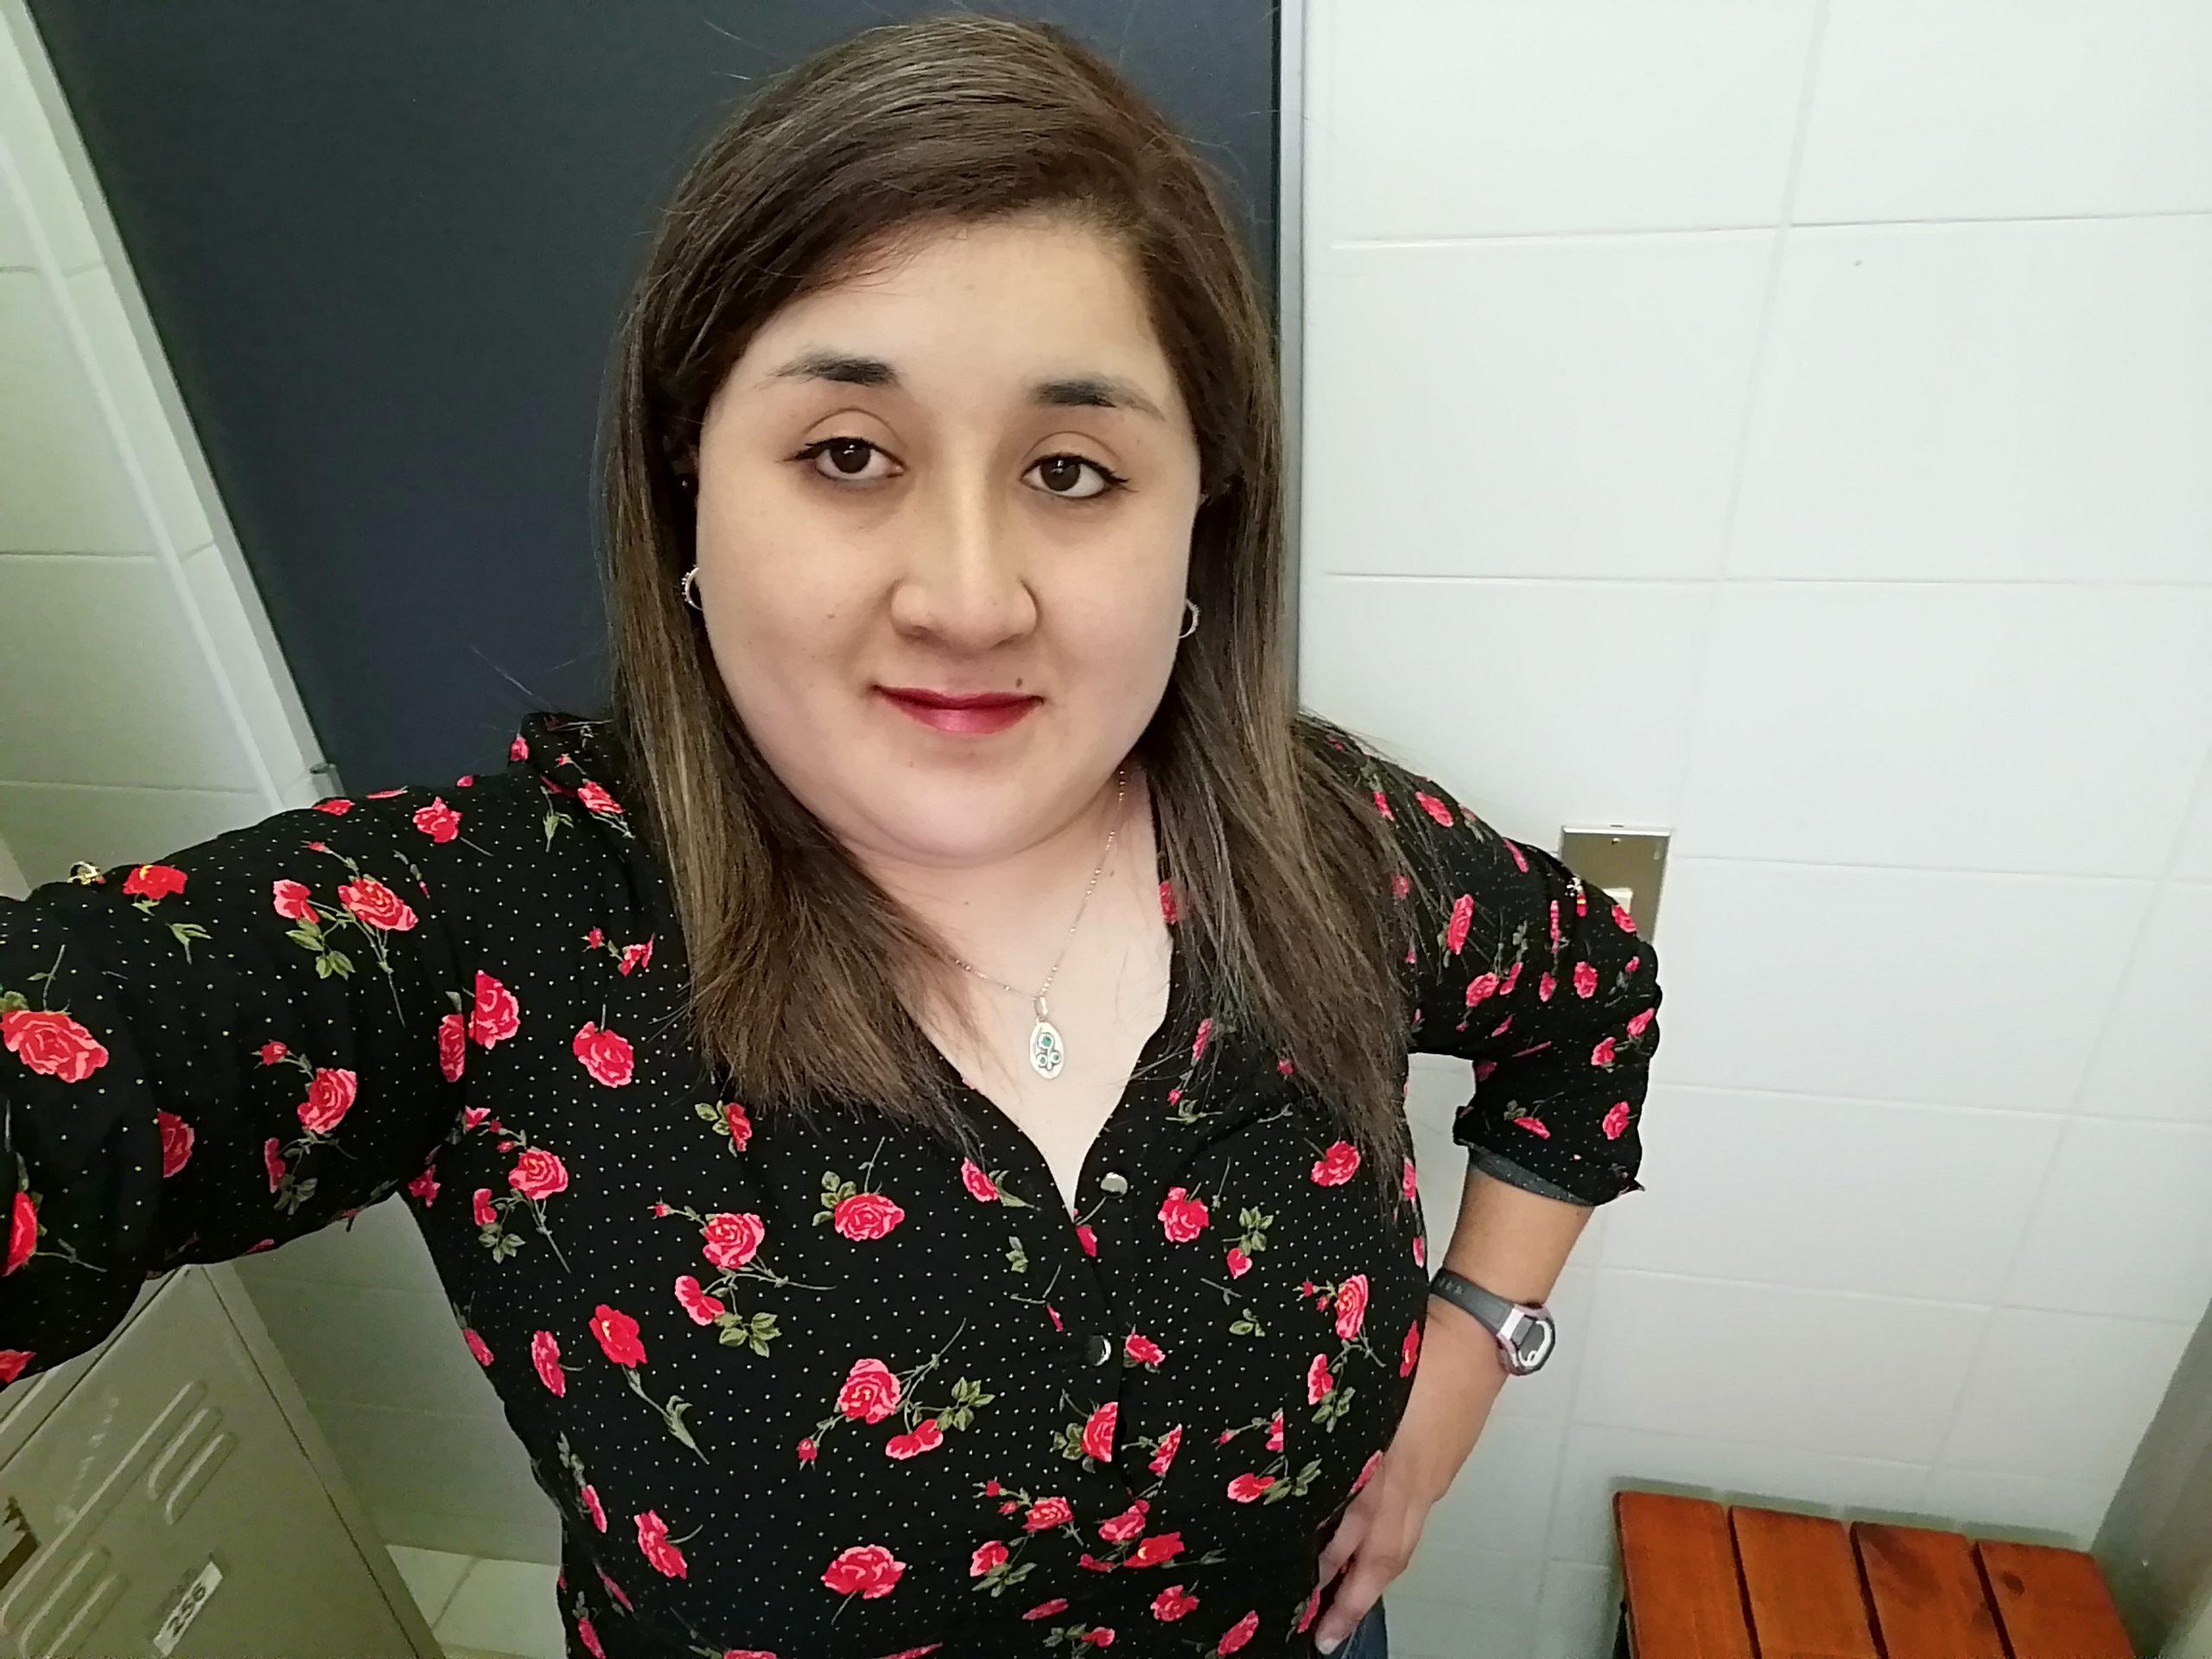 Valeria Catrilef Marinao